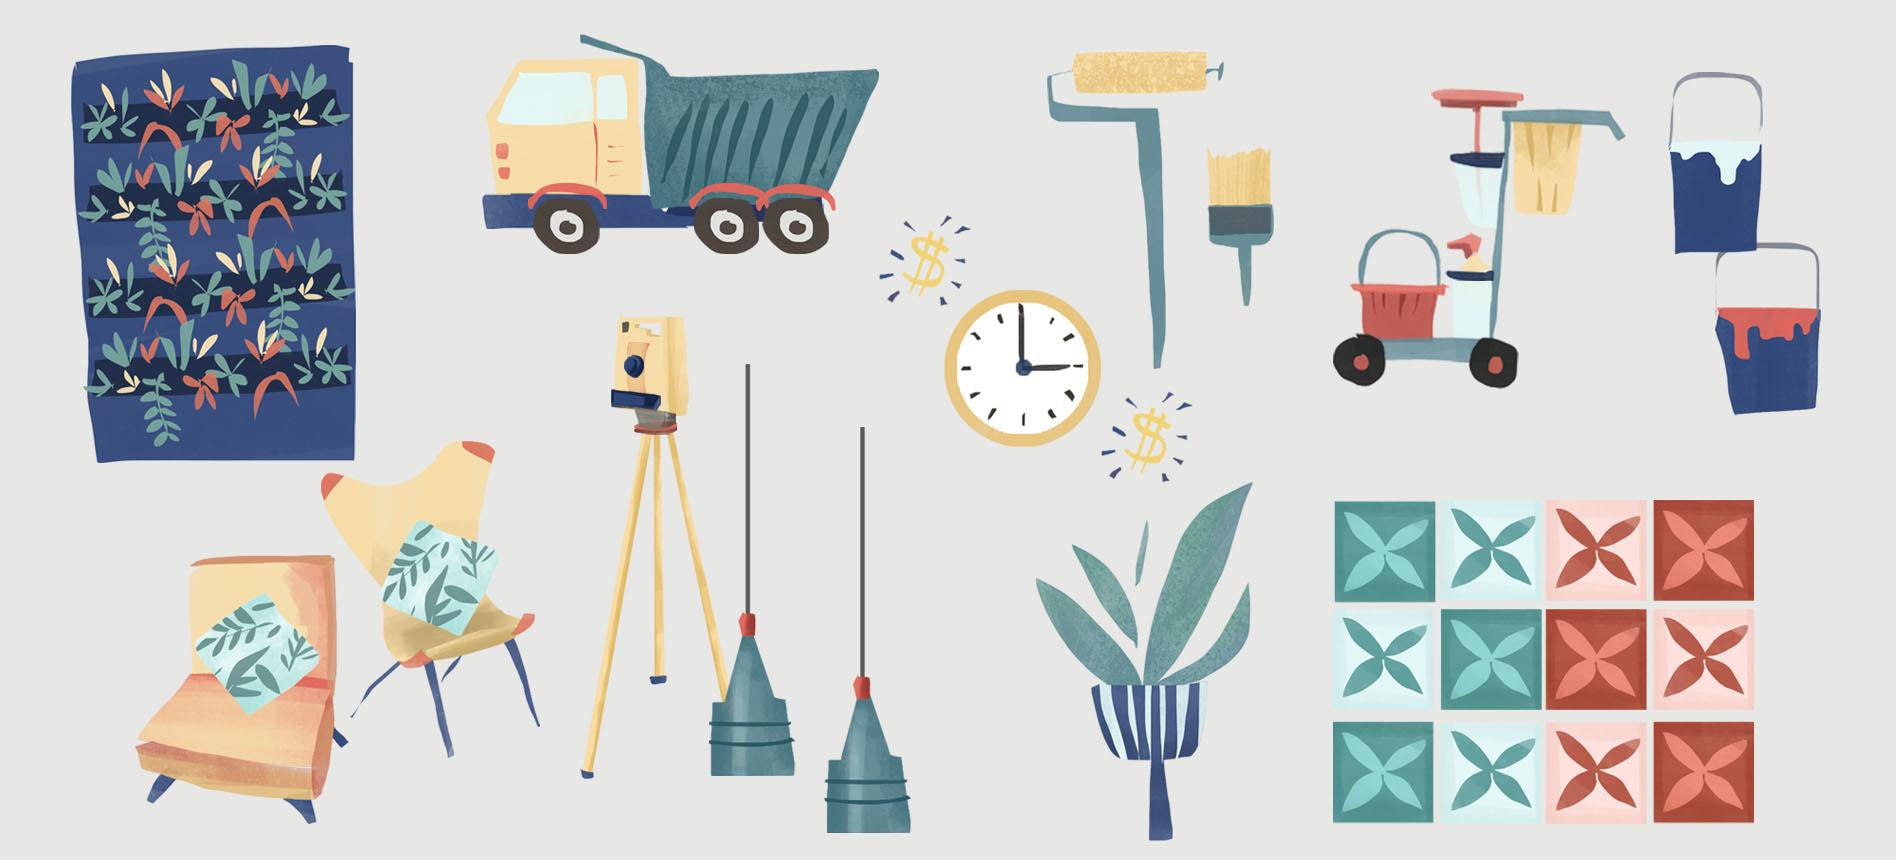 8 Construction Business Ideas